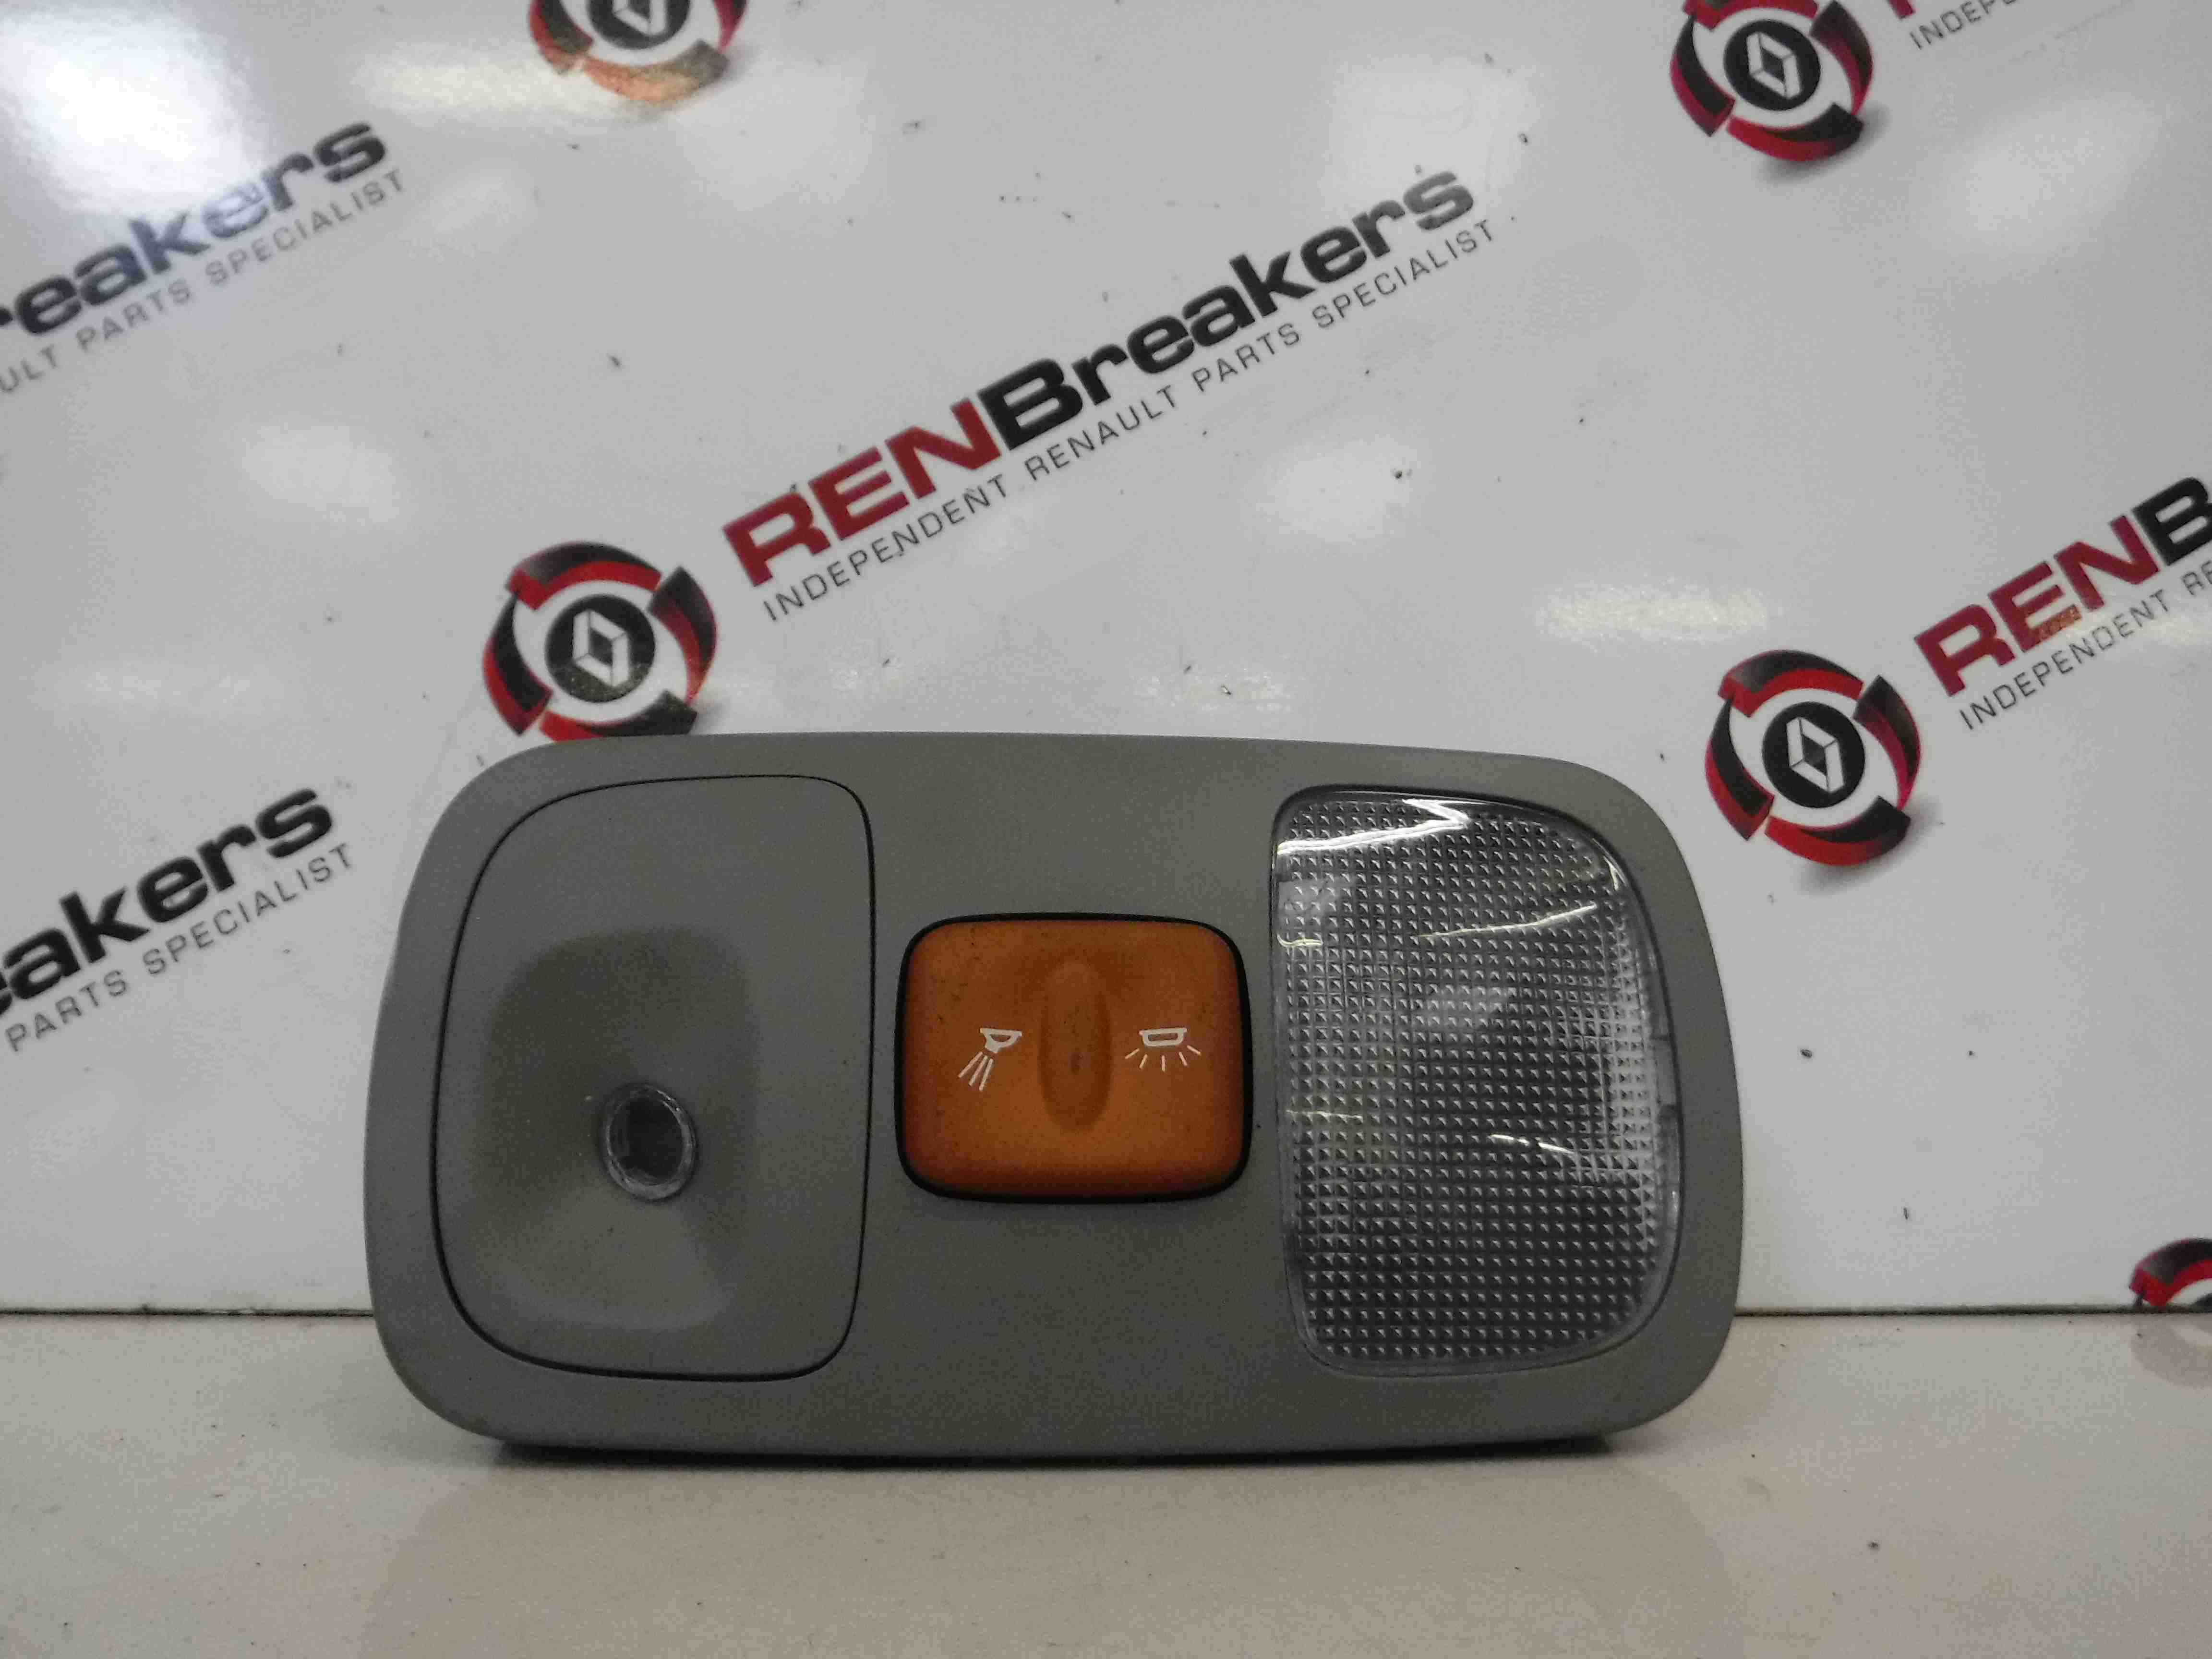 Renault Megane Scenic 1999-2003 Interior Light Courtesy Orange Button